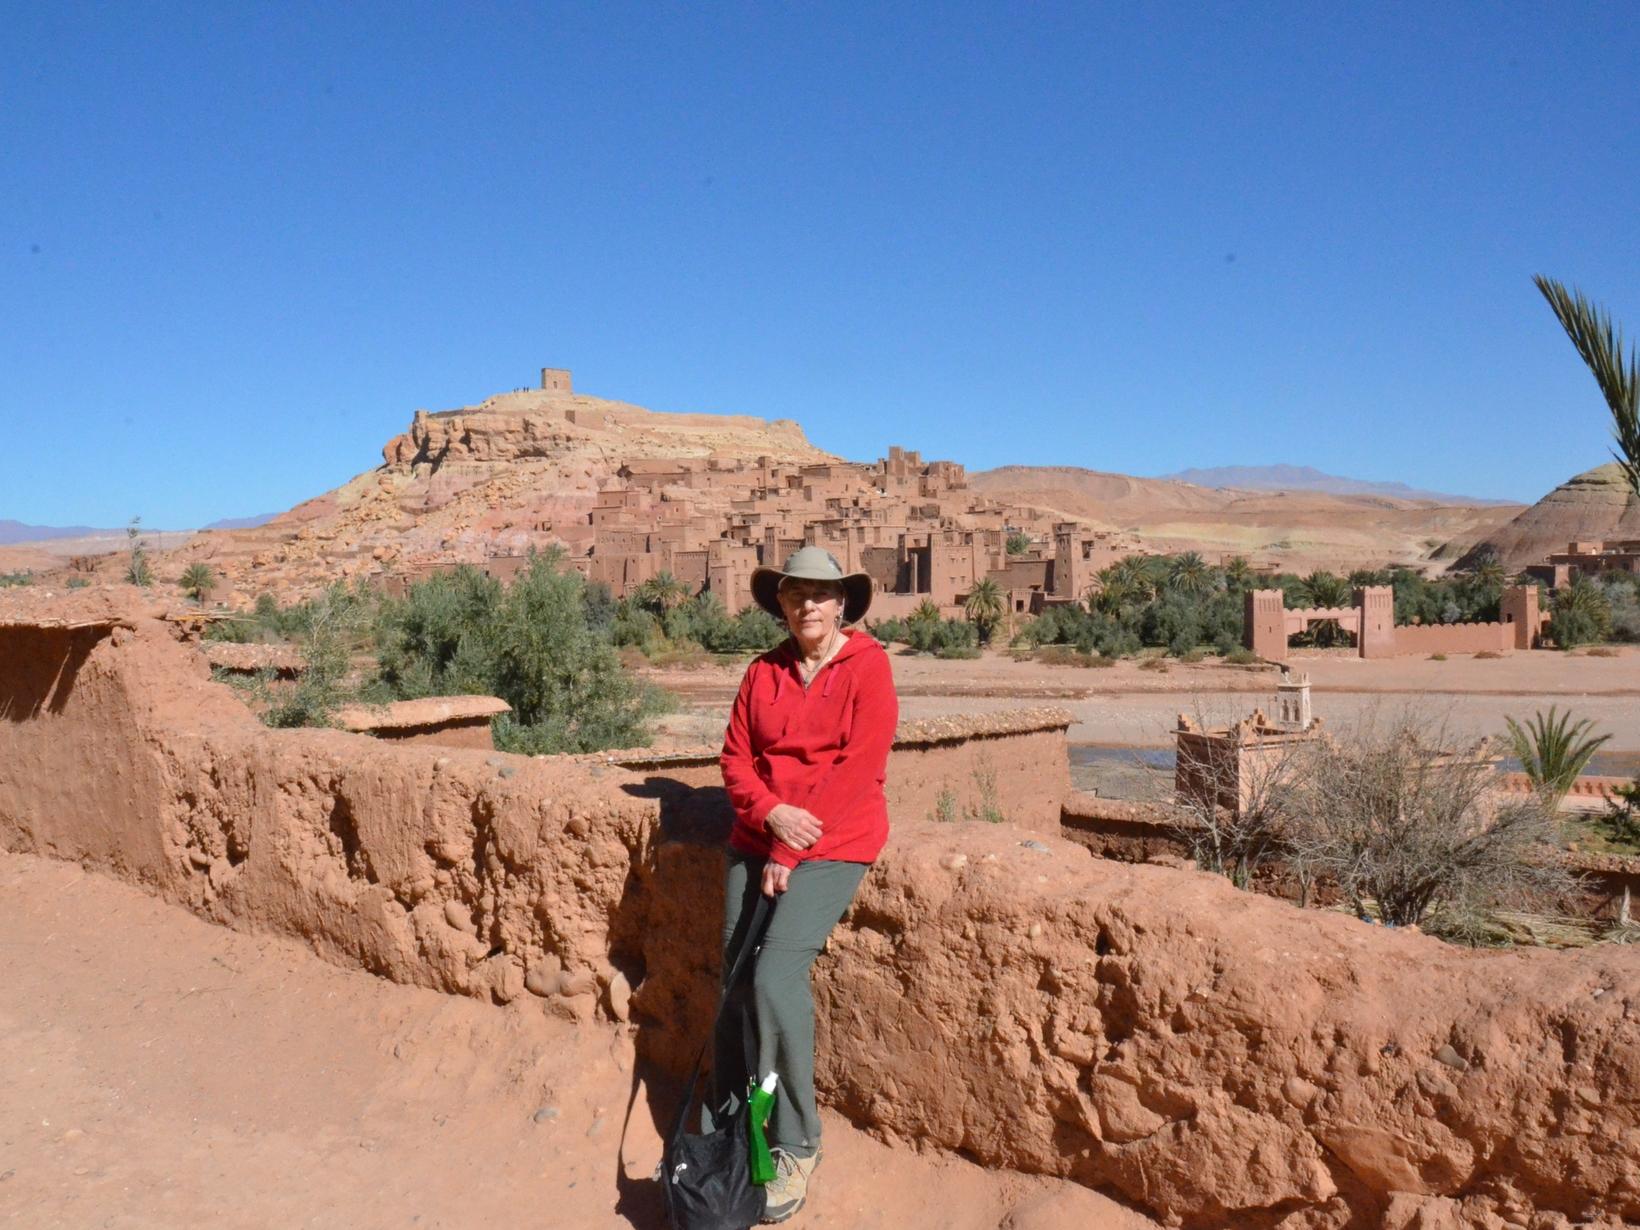 Judy from Stillwater, Minnesota, United States